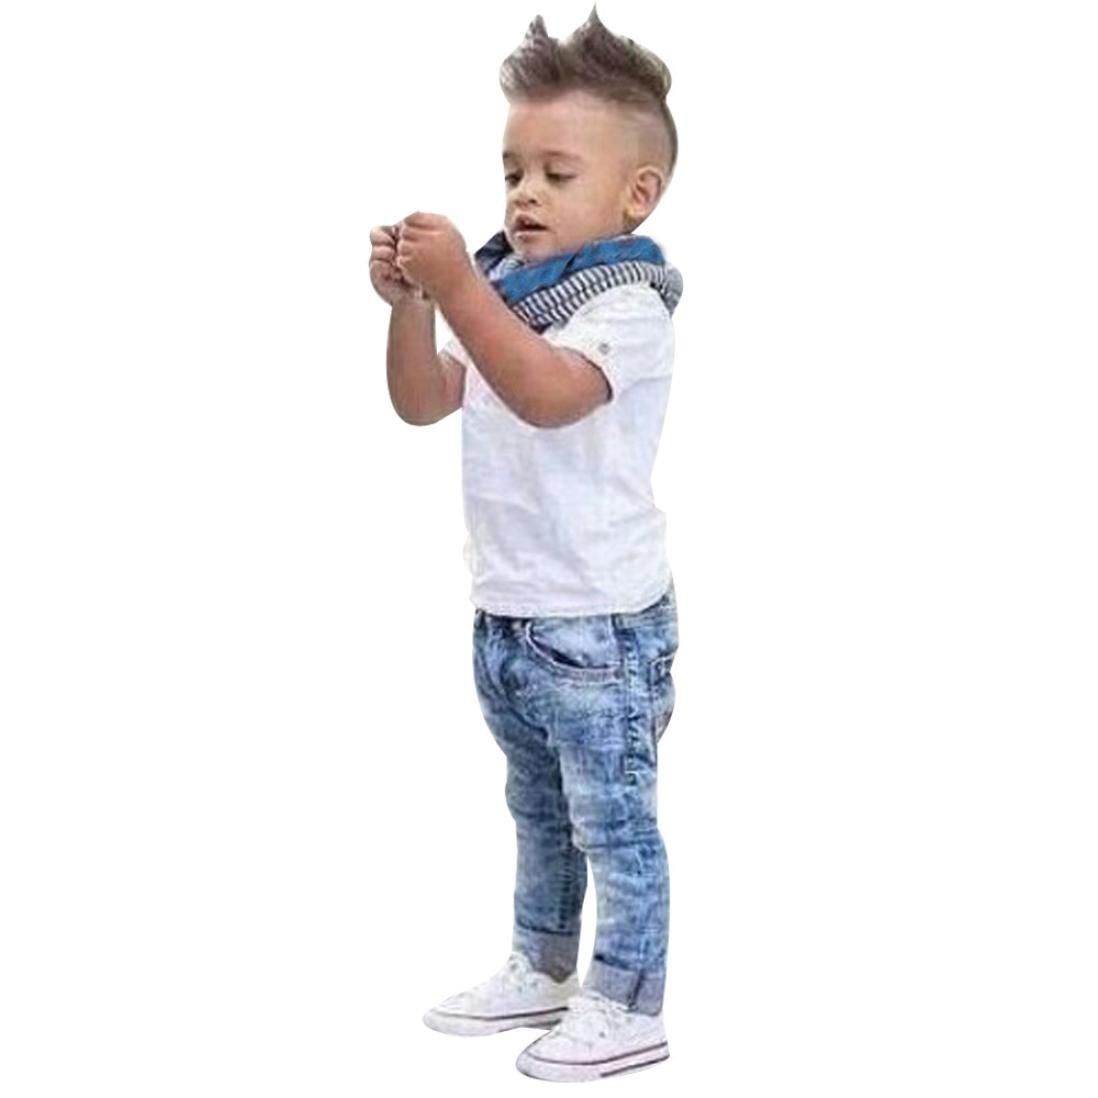 Conjuntos Lindo Bebe Niño, Sonnena Botones T-Shirt Manga Corta Camiseta Top + Jeans Pantalones Largos + Bufanda Traje Ropa Conjuntos